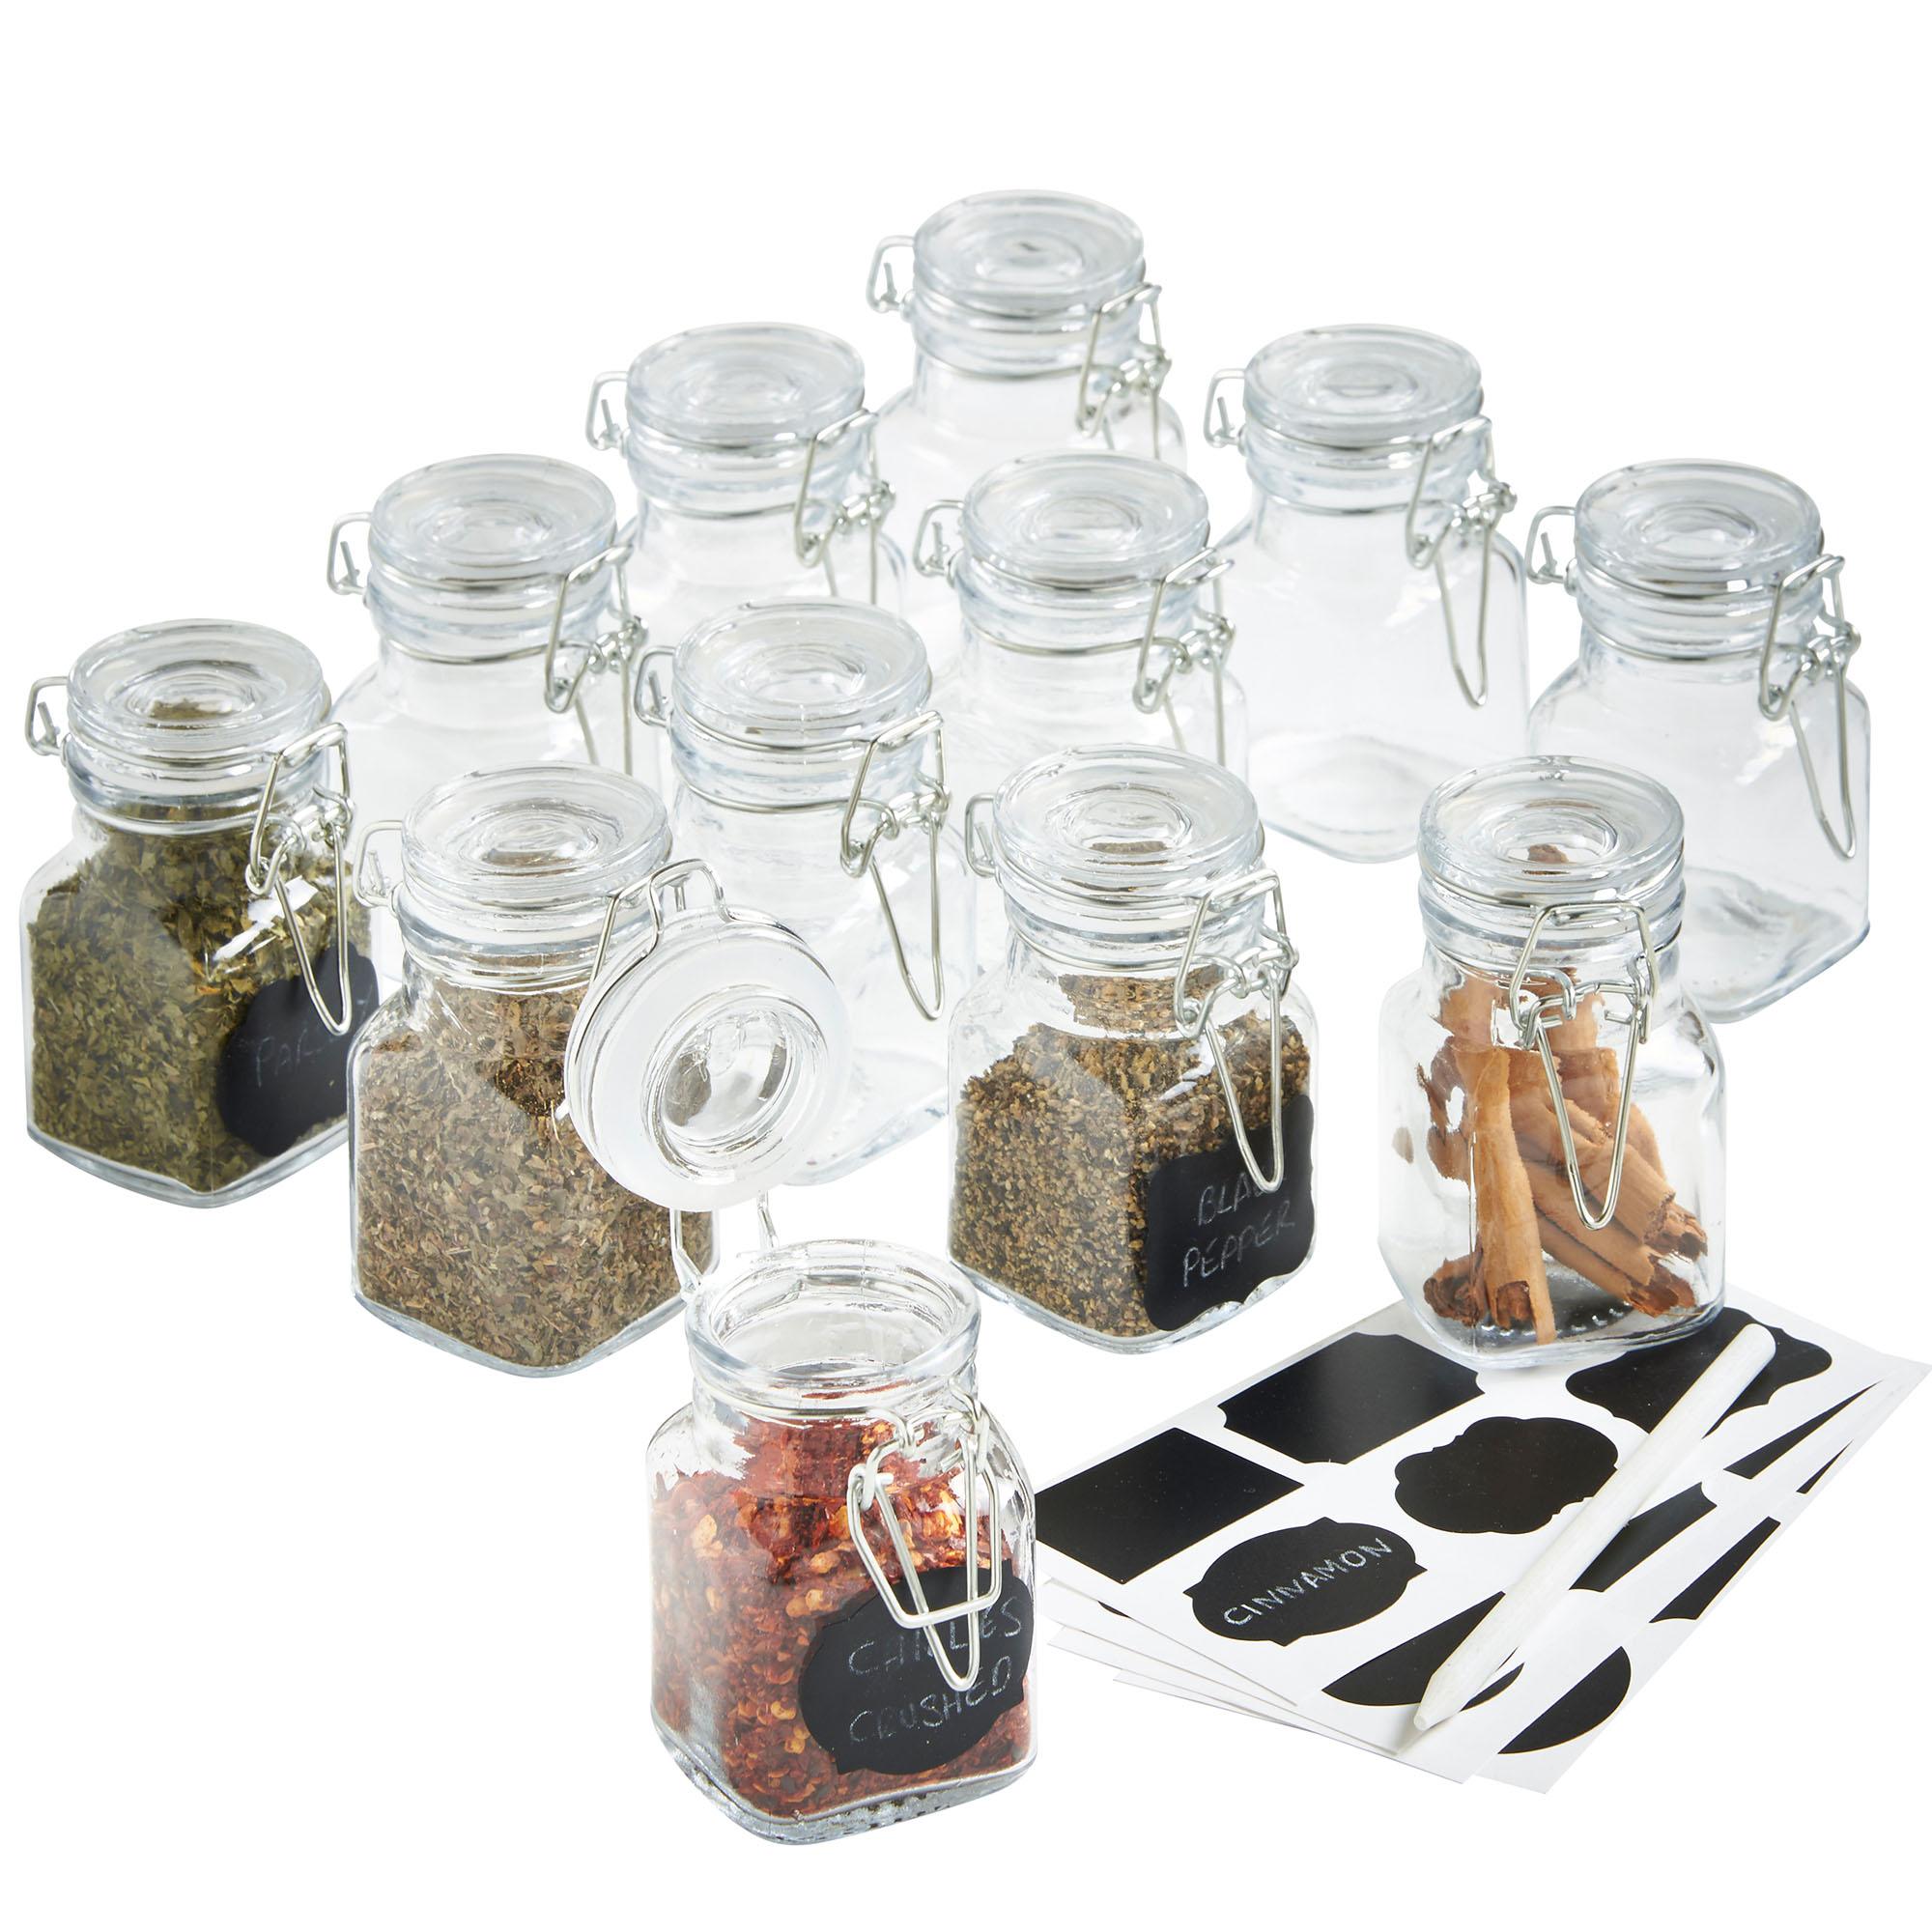 VonShef 12 x Mini Clip Top Airtight Seal Food Spice Storage Preserve